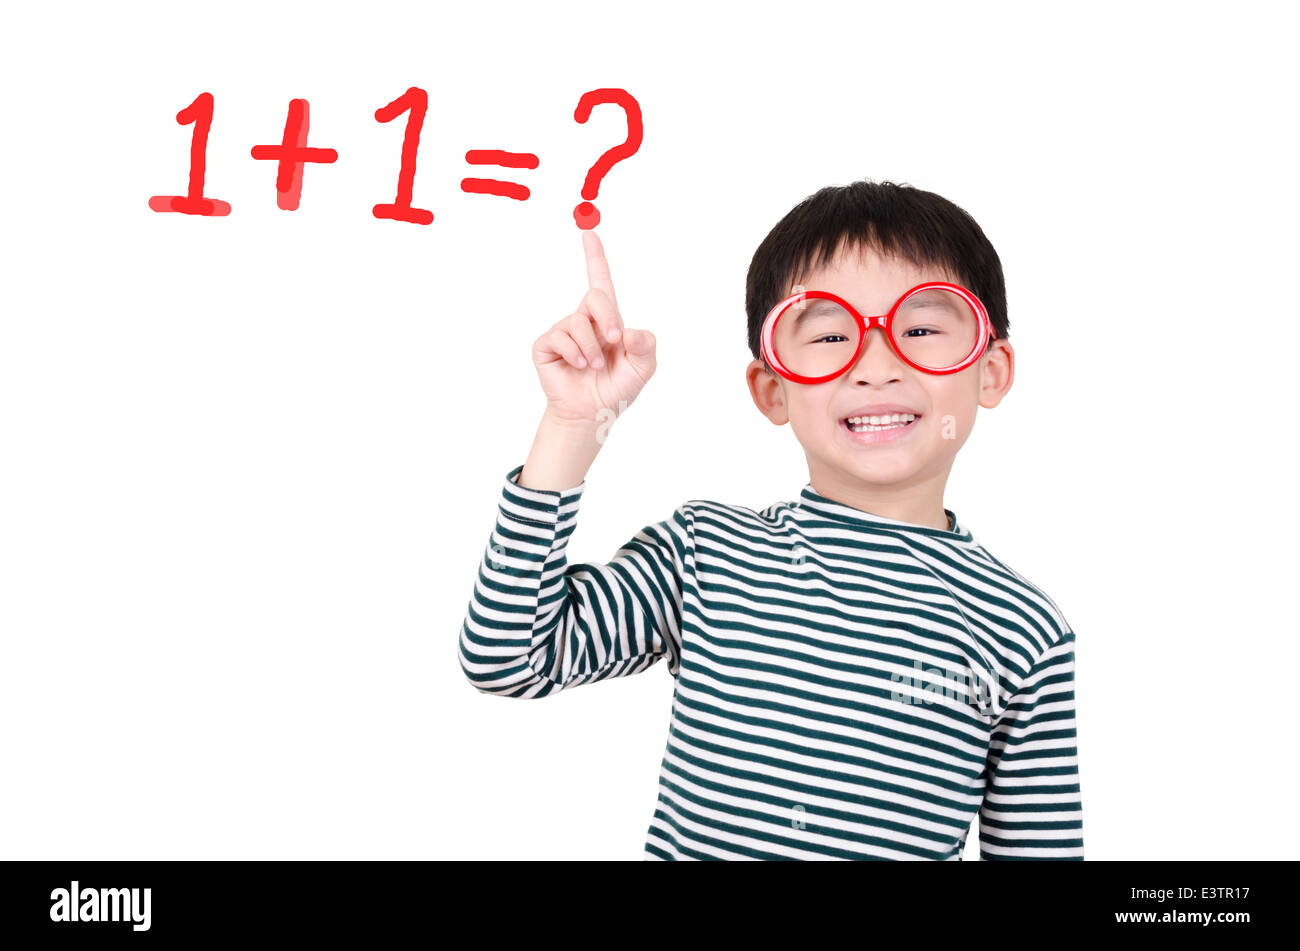 Smart cute boy thinking math question Stock Photo: 71230355 - Alamy